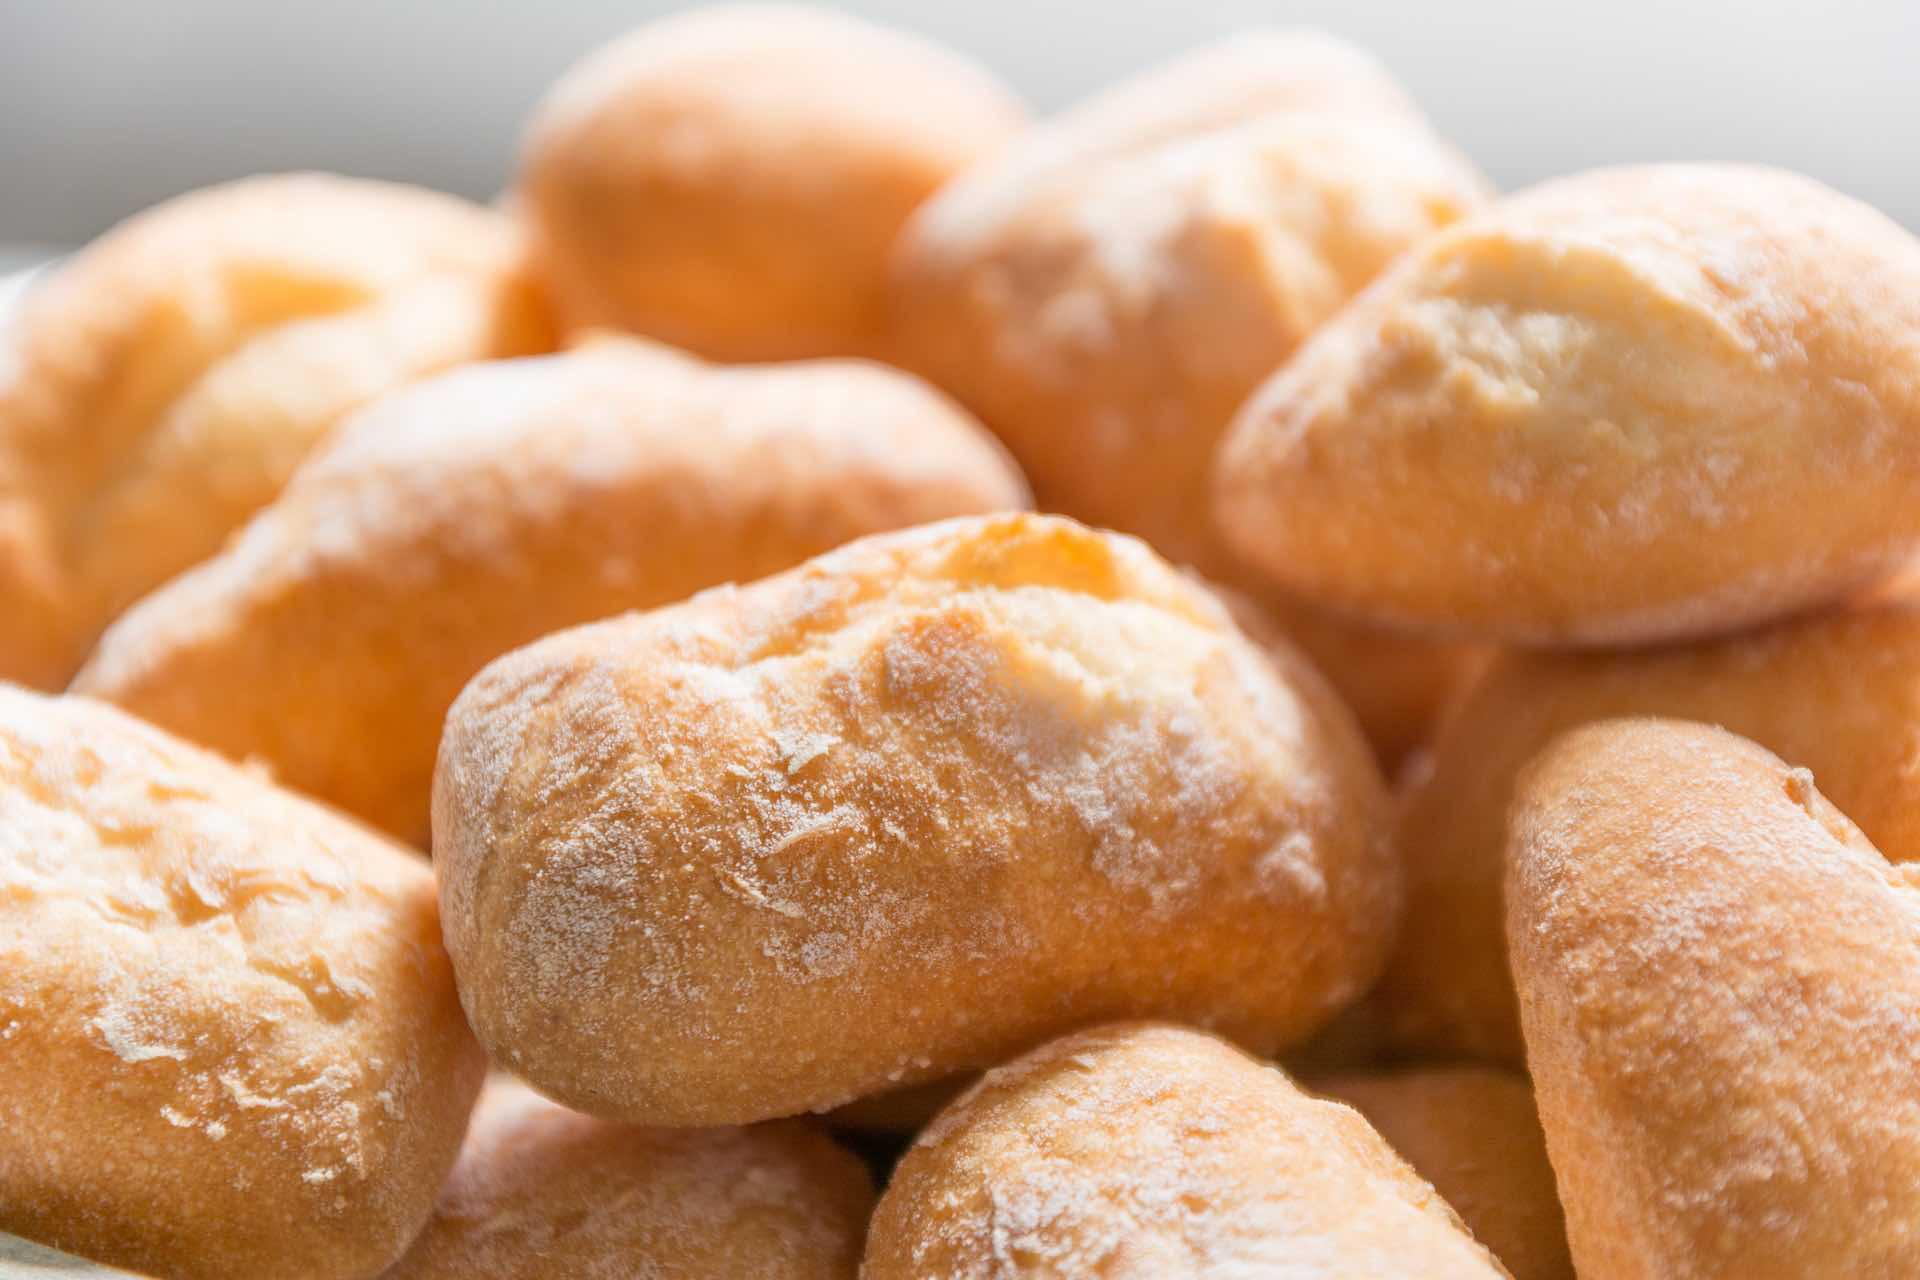 bread-gluten-leaky-gut-functional-medicine